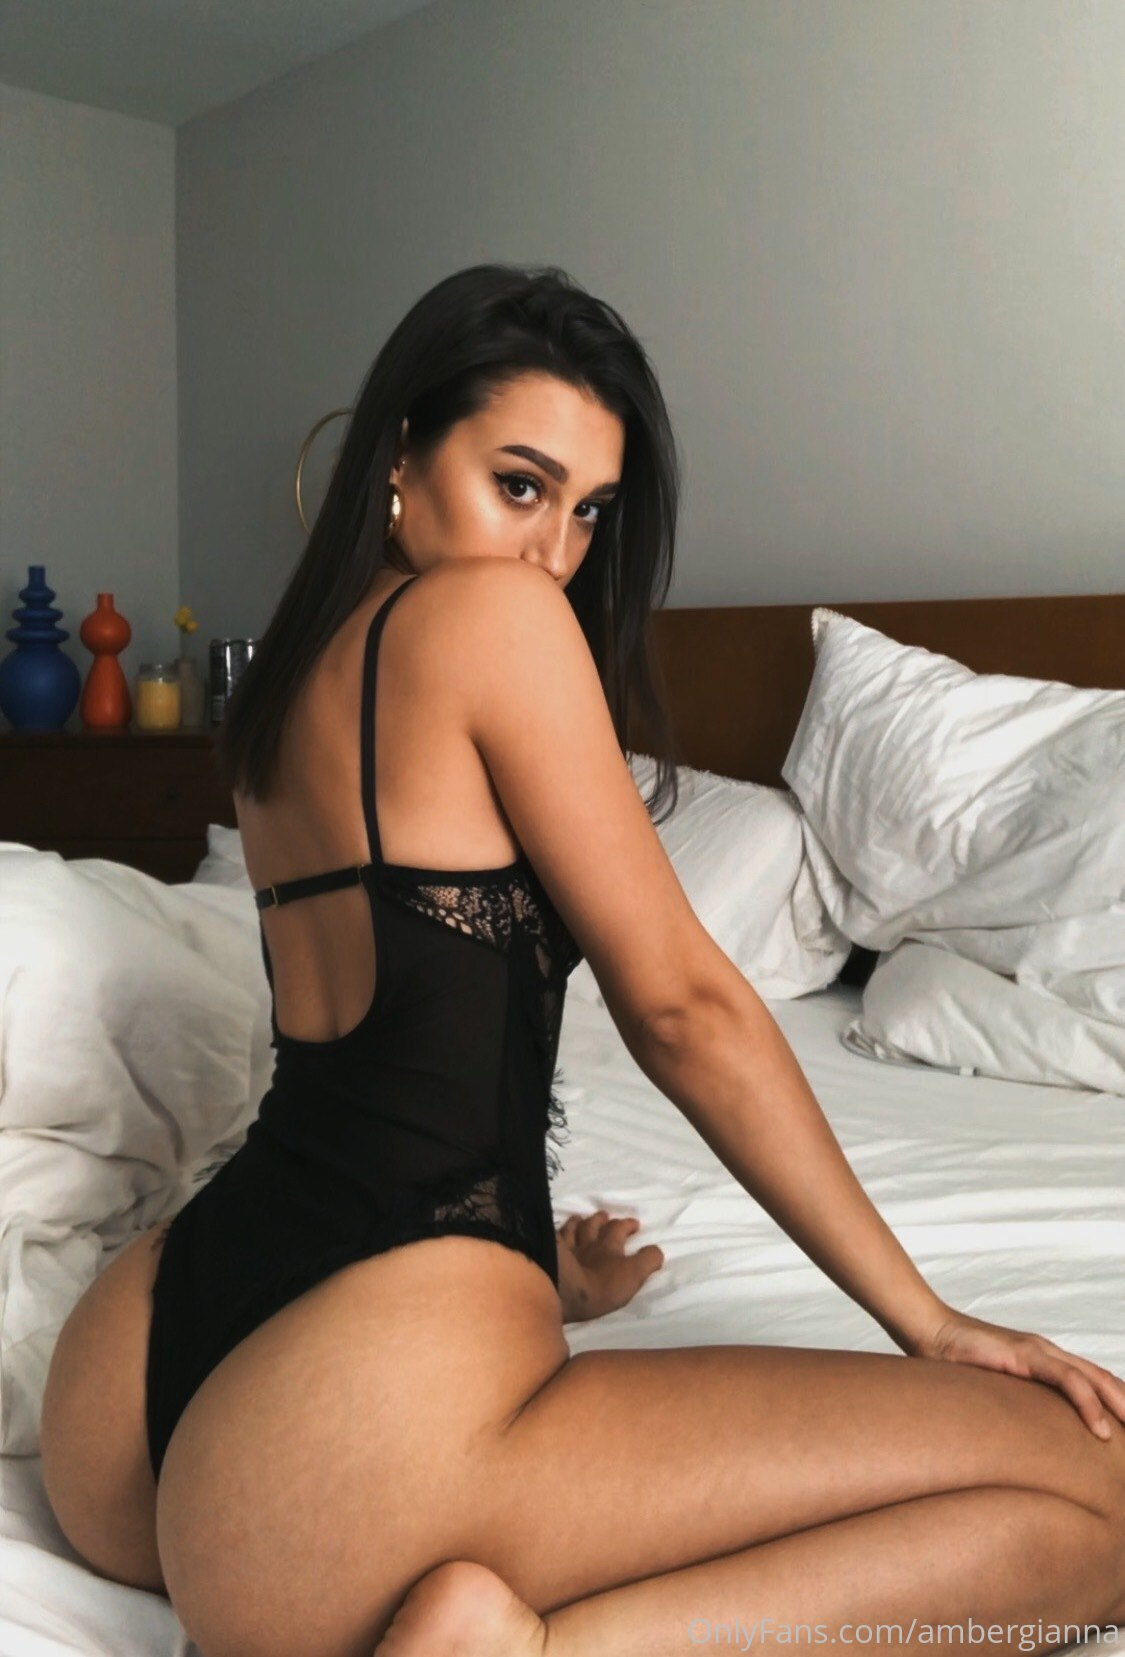 Amber Gianna Leaked 0126